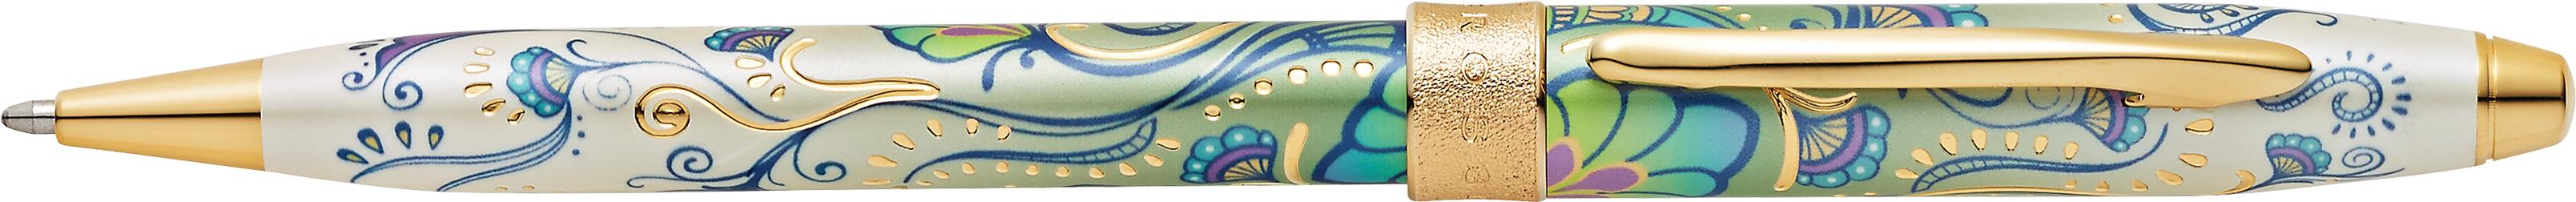 Botanica Green Daylily Ballpoint Pen